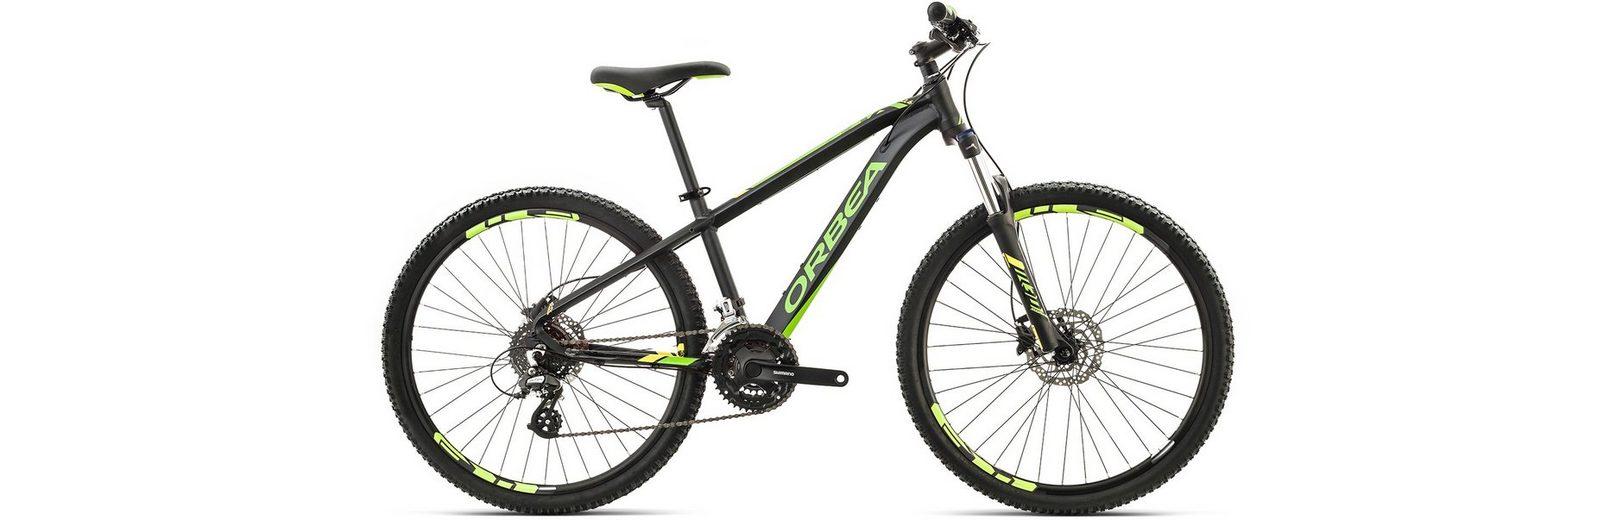 ORBEA Hardtail Mountainbike, 26 Zoll, 24 Gang Shimano Altus Kettenschaltung, »MX 26 XC«